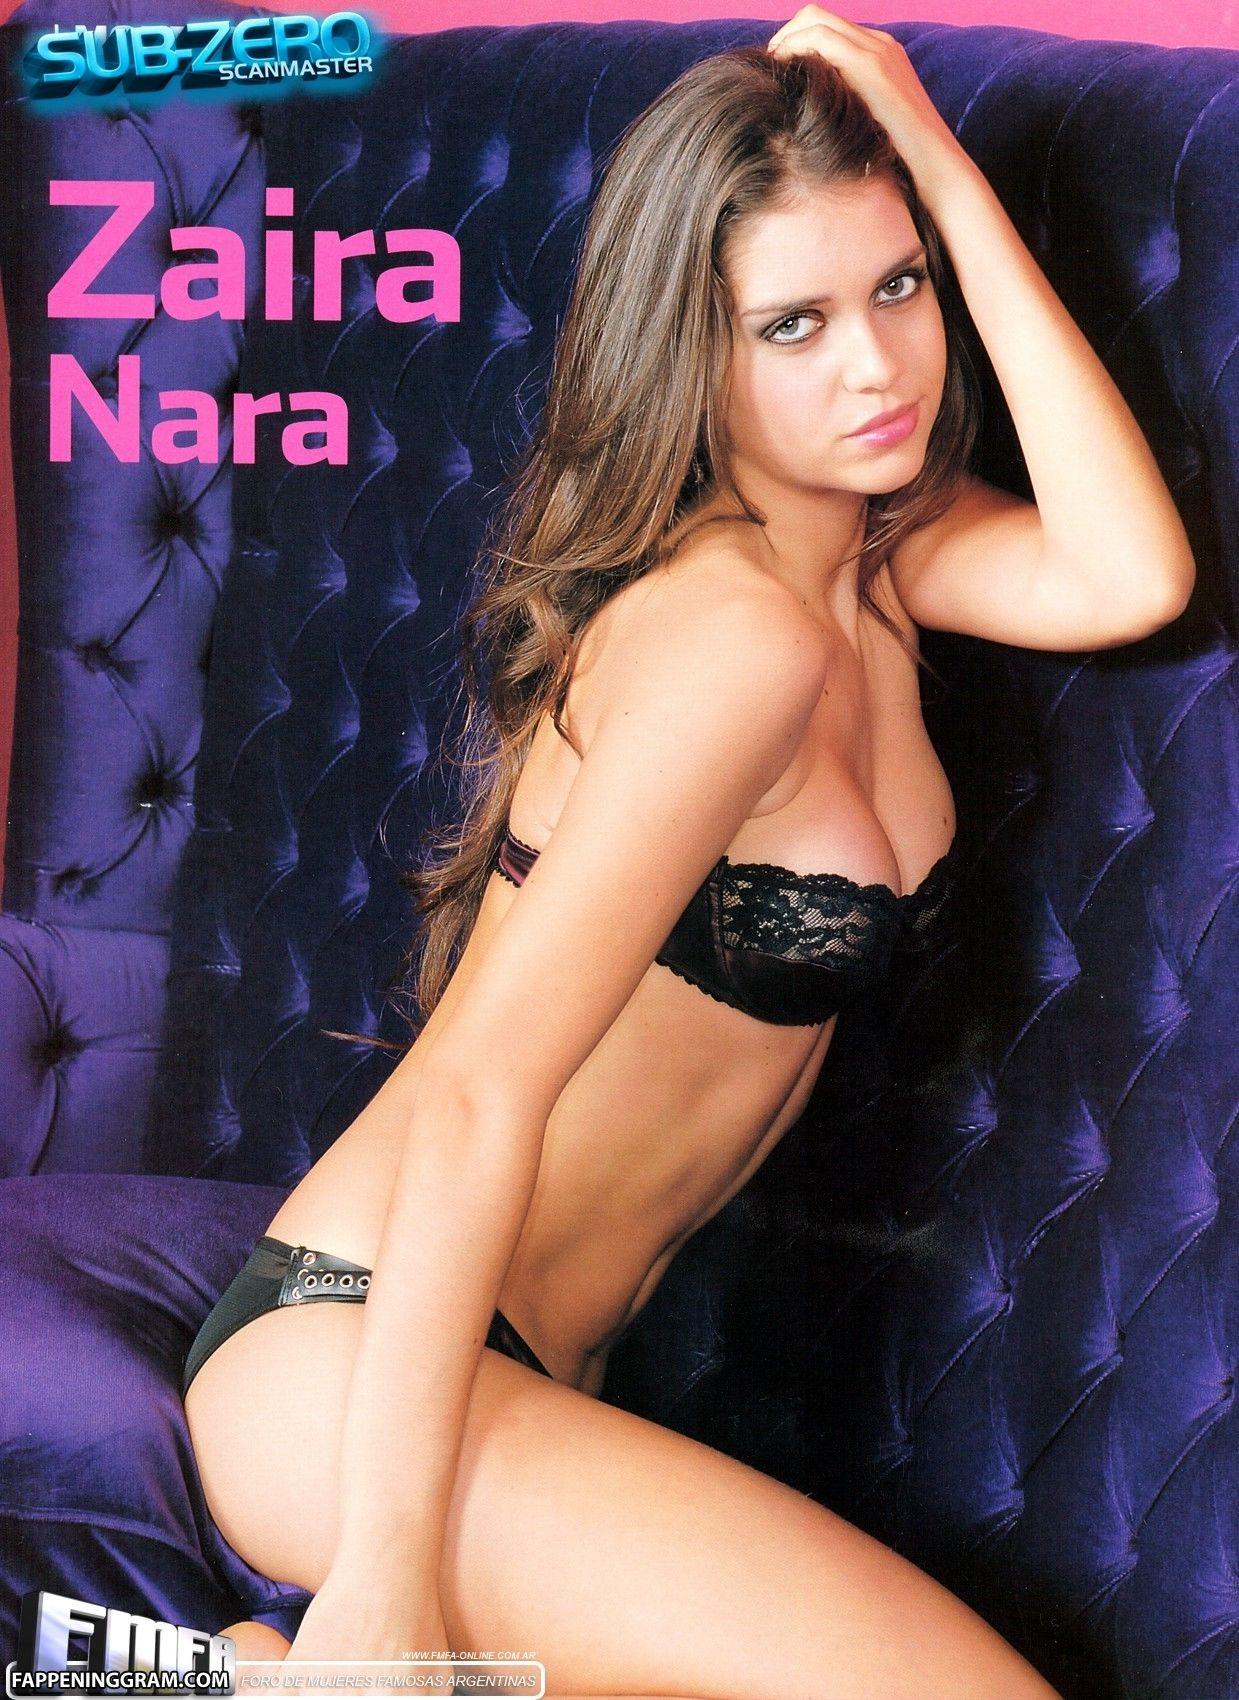 Zaira nara sexy girl legs